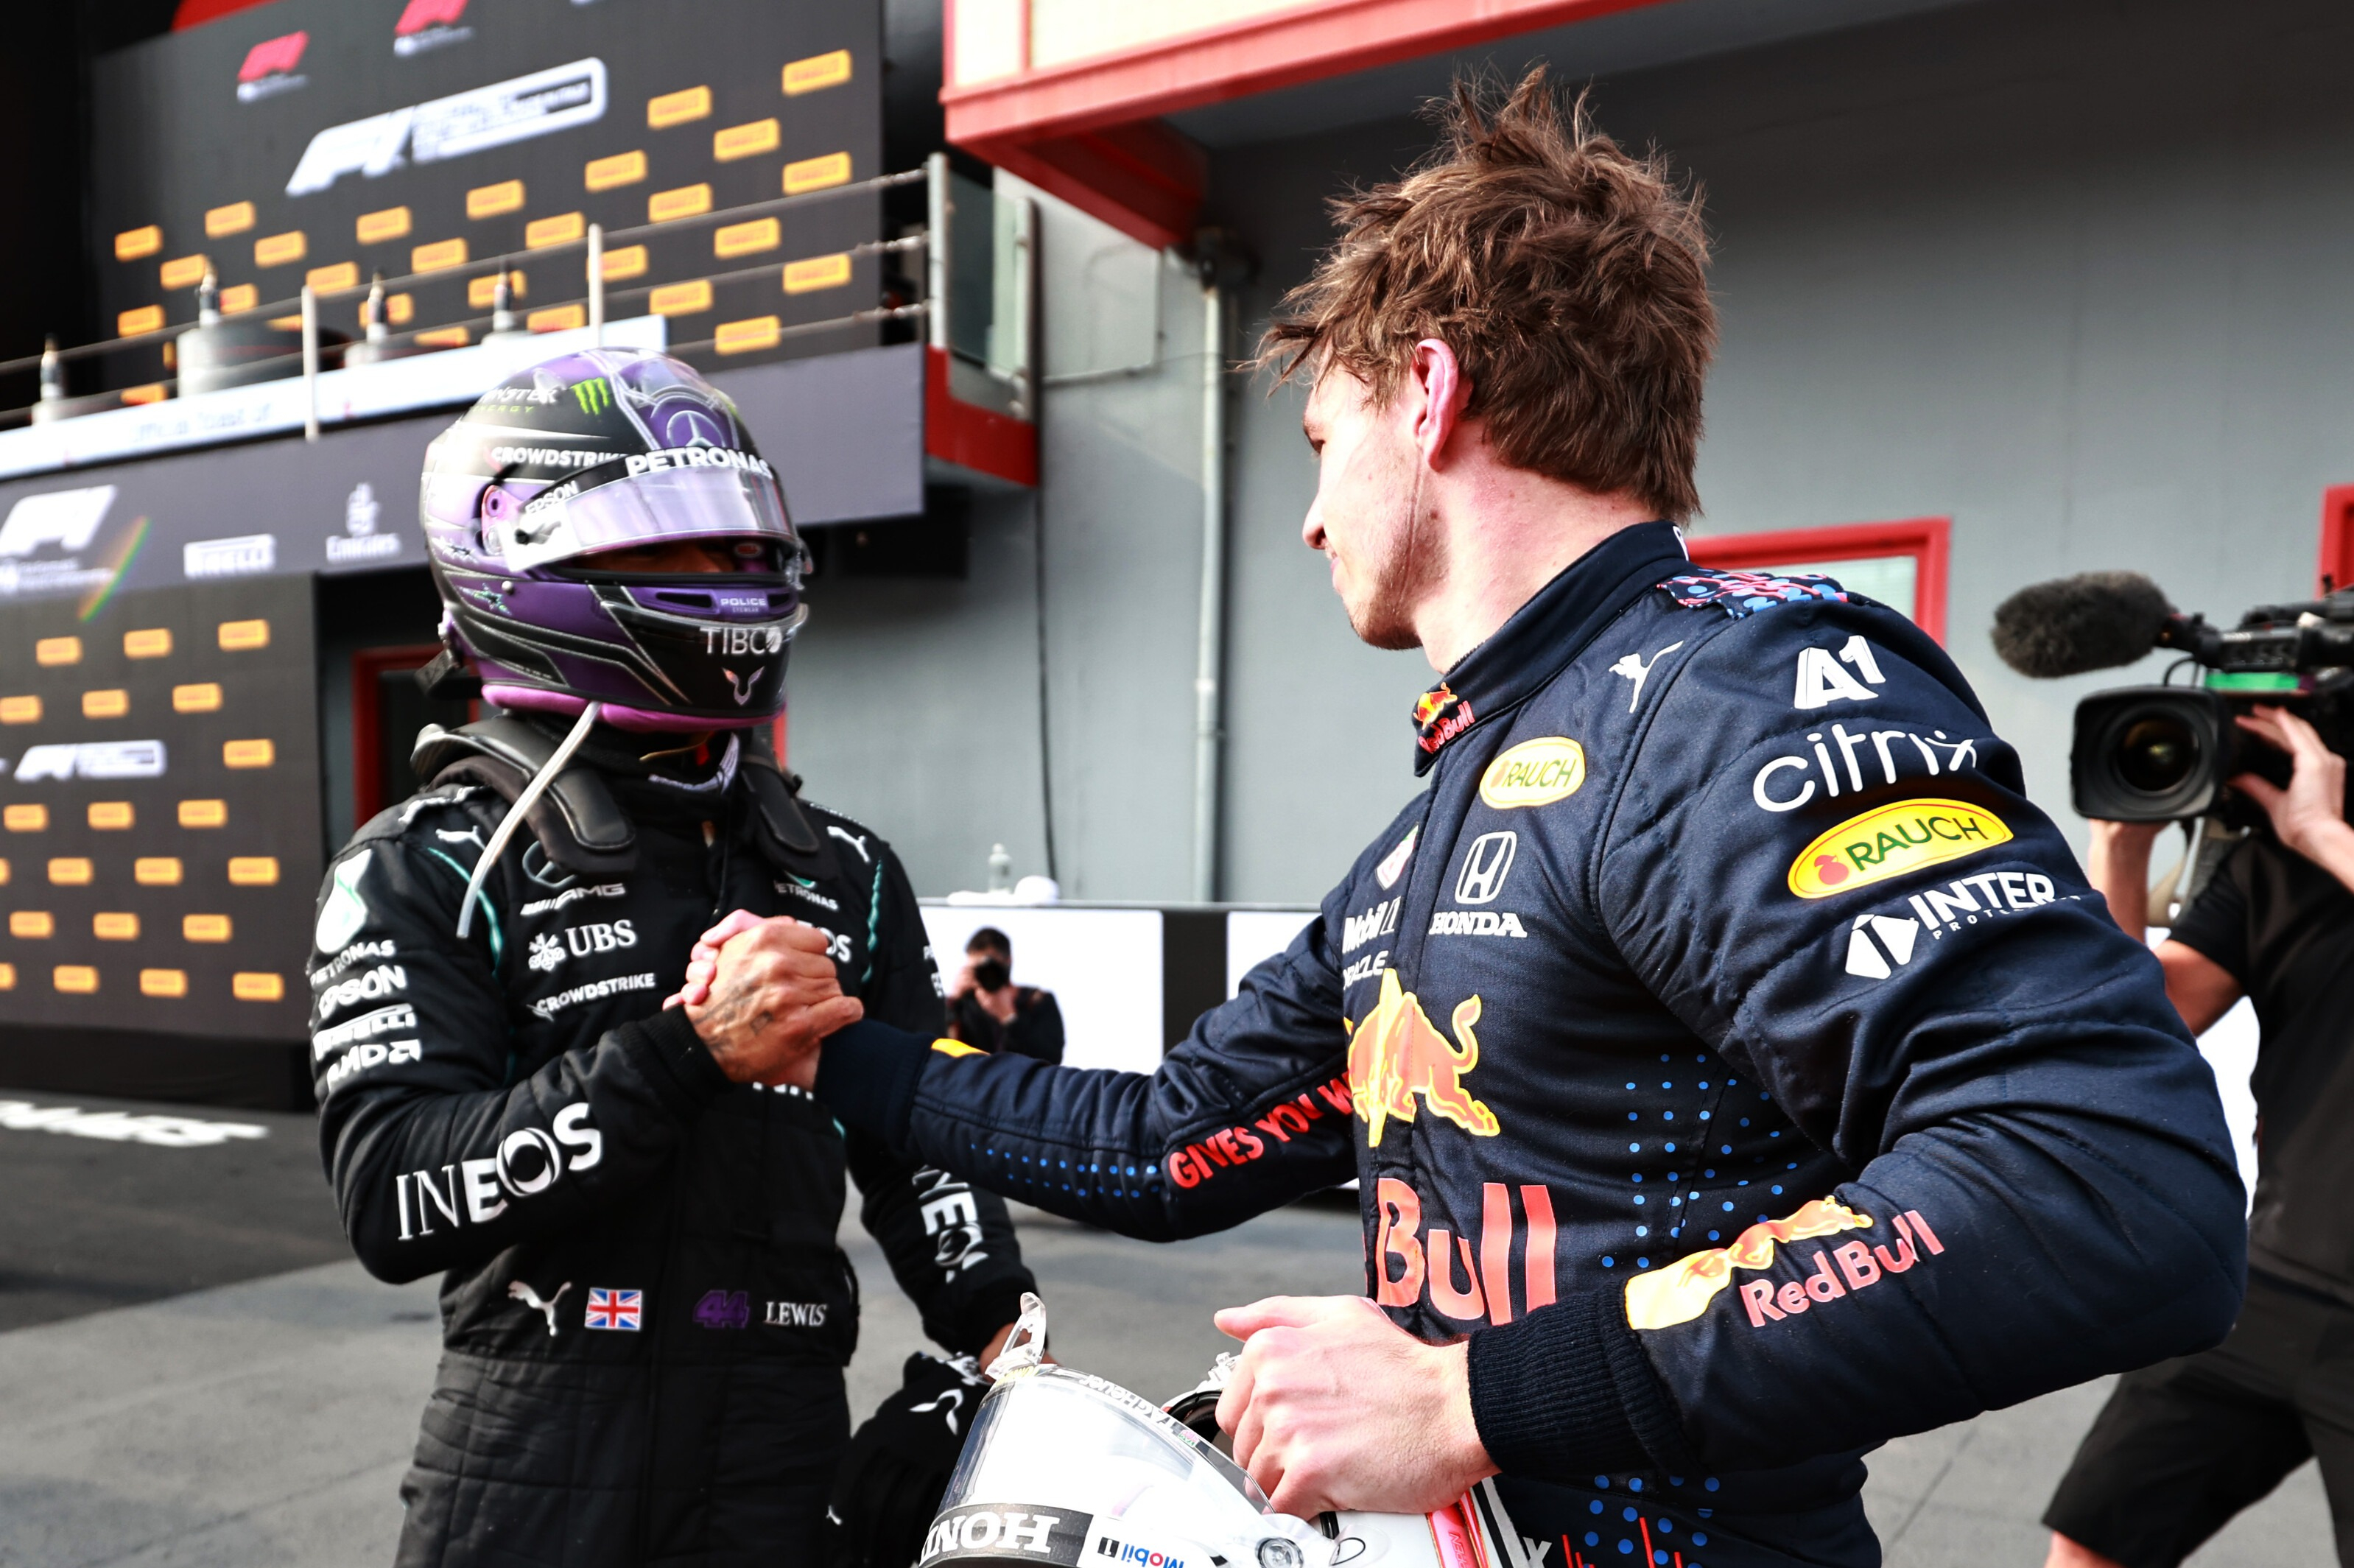 Lewis Hamilton congratulates Max Verstappen after the 2021 Emilia Romagna GP